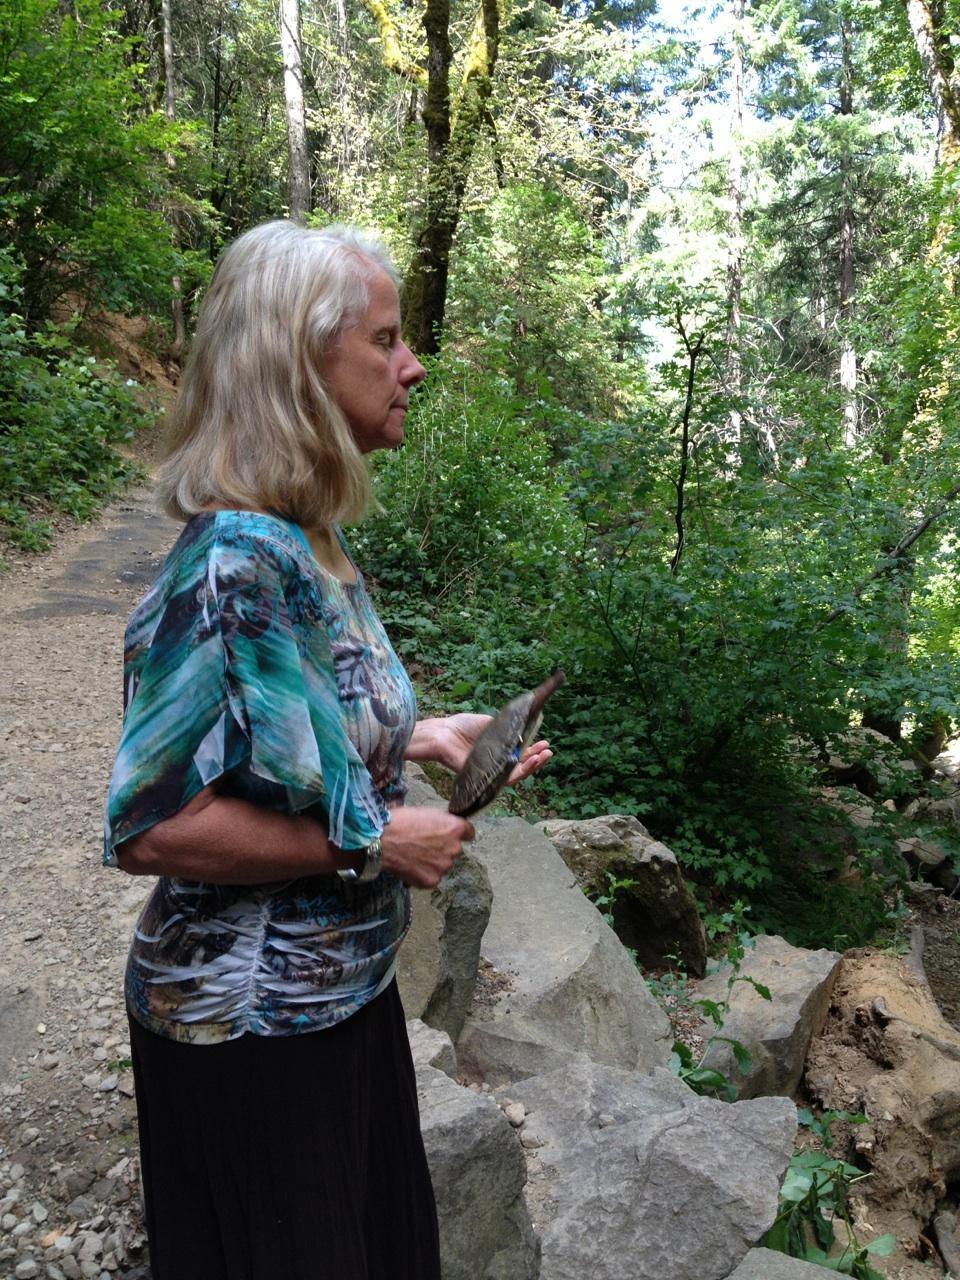 Mt Shasta Medicine Woman